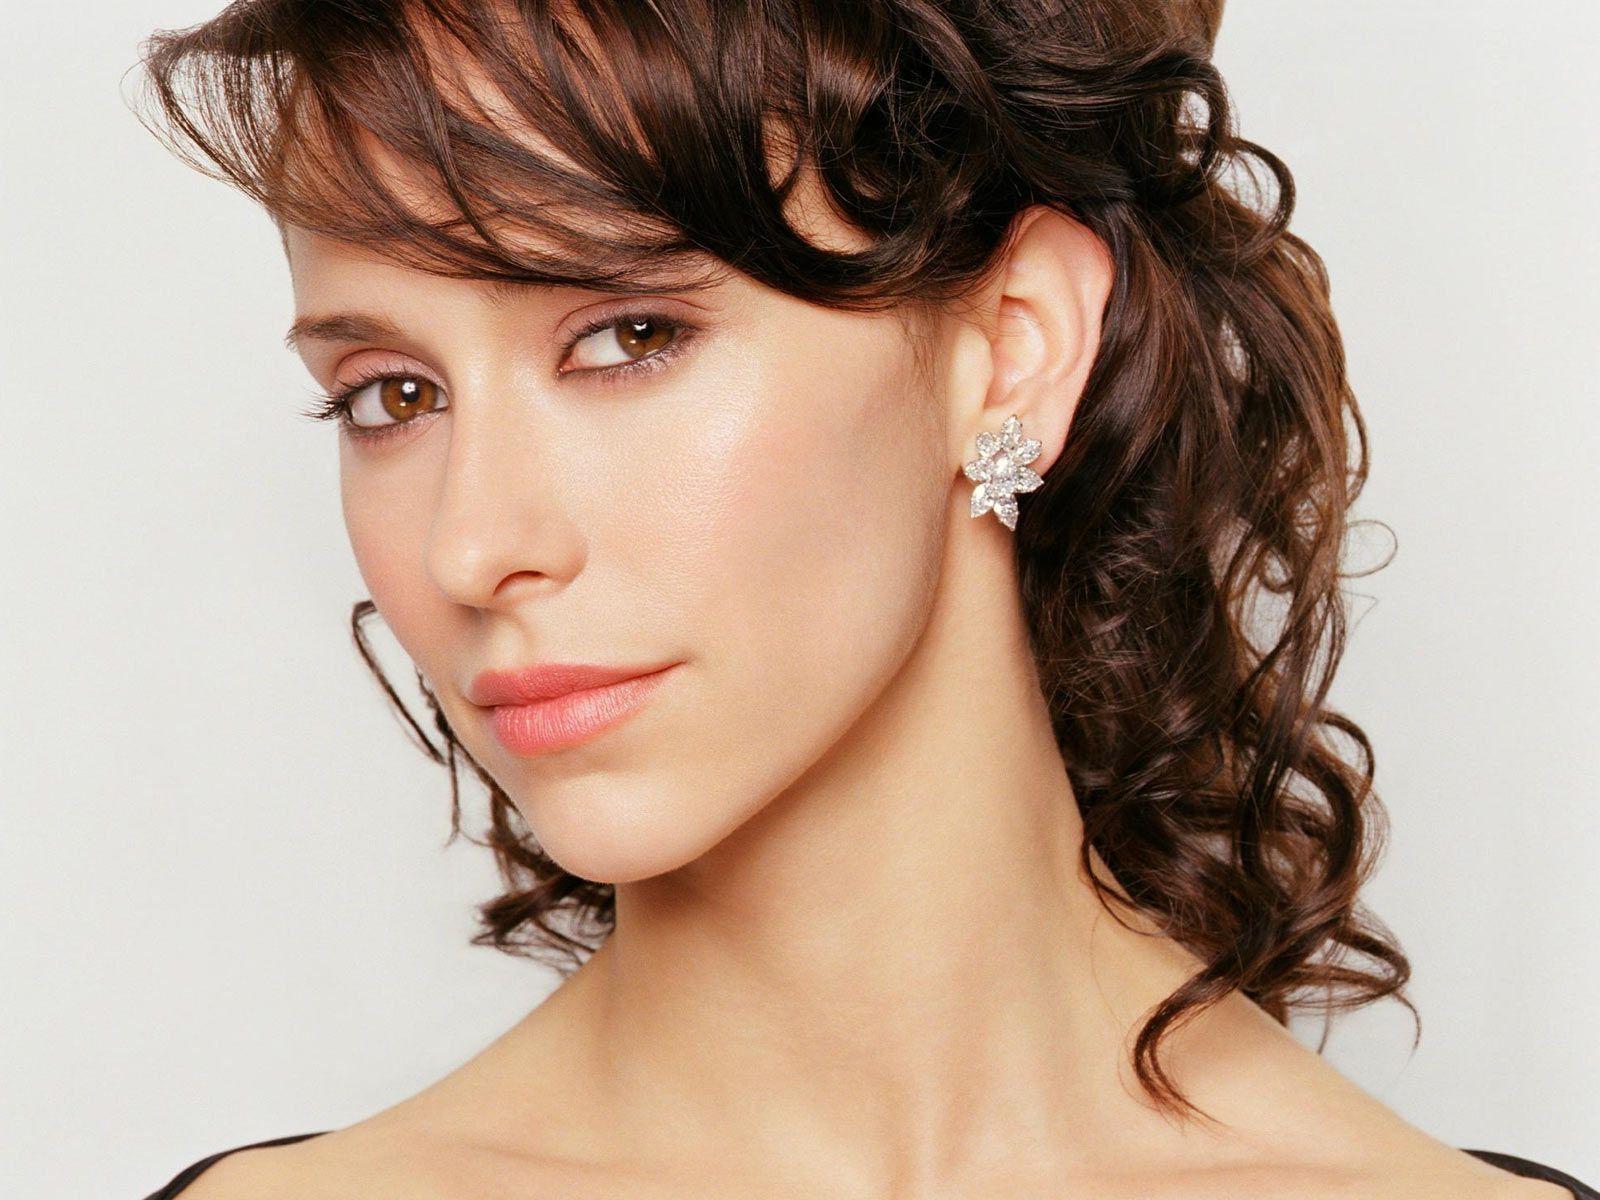 Jennifer Love Hewitt Hairstyles 2013 11